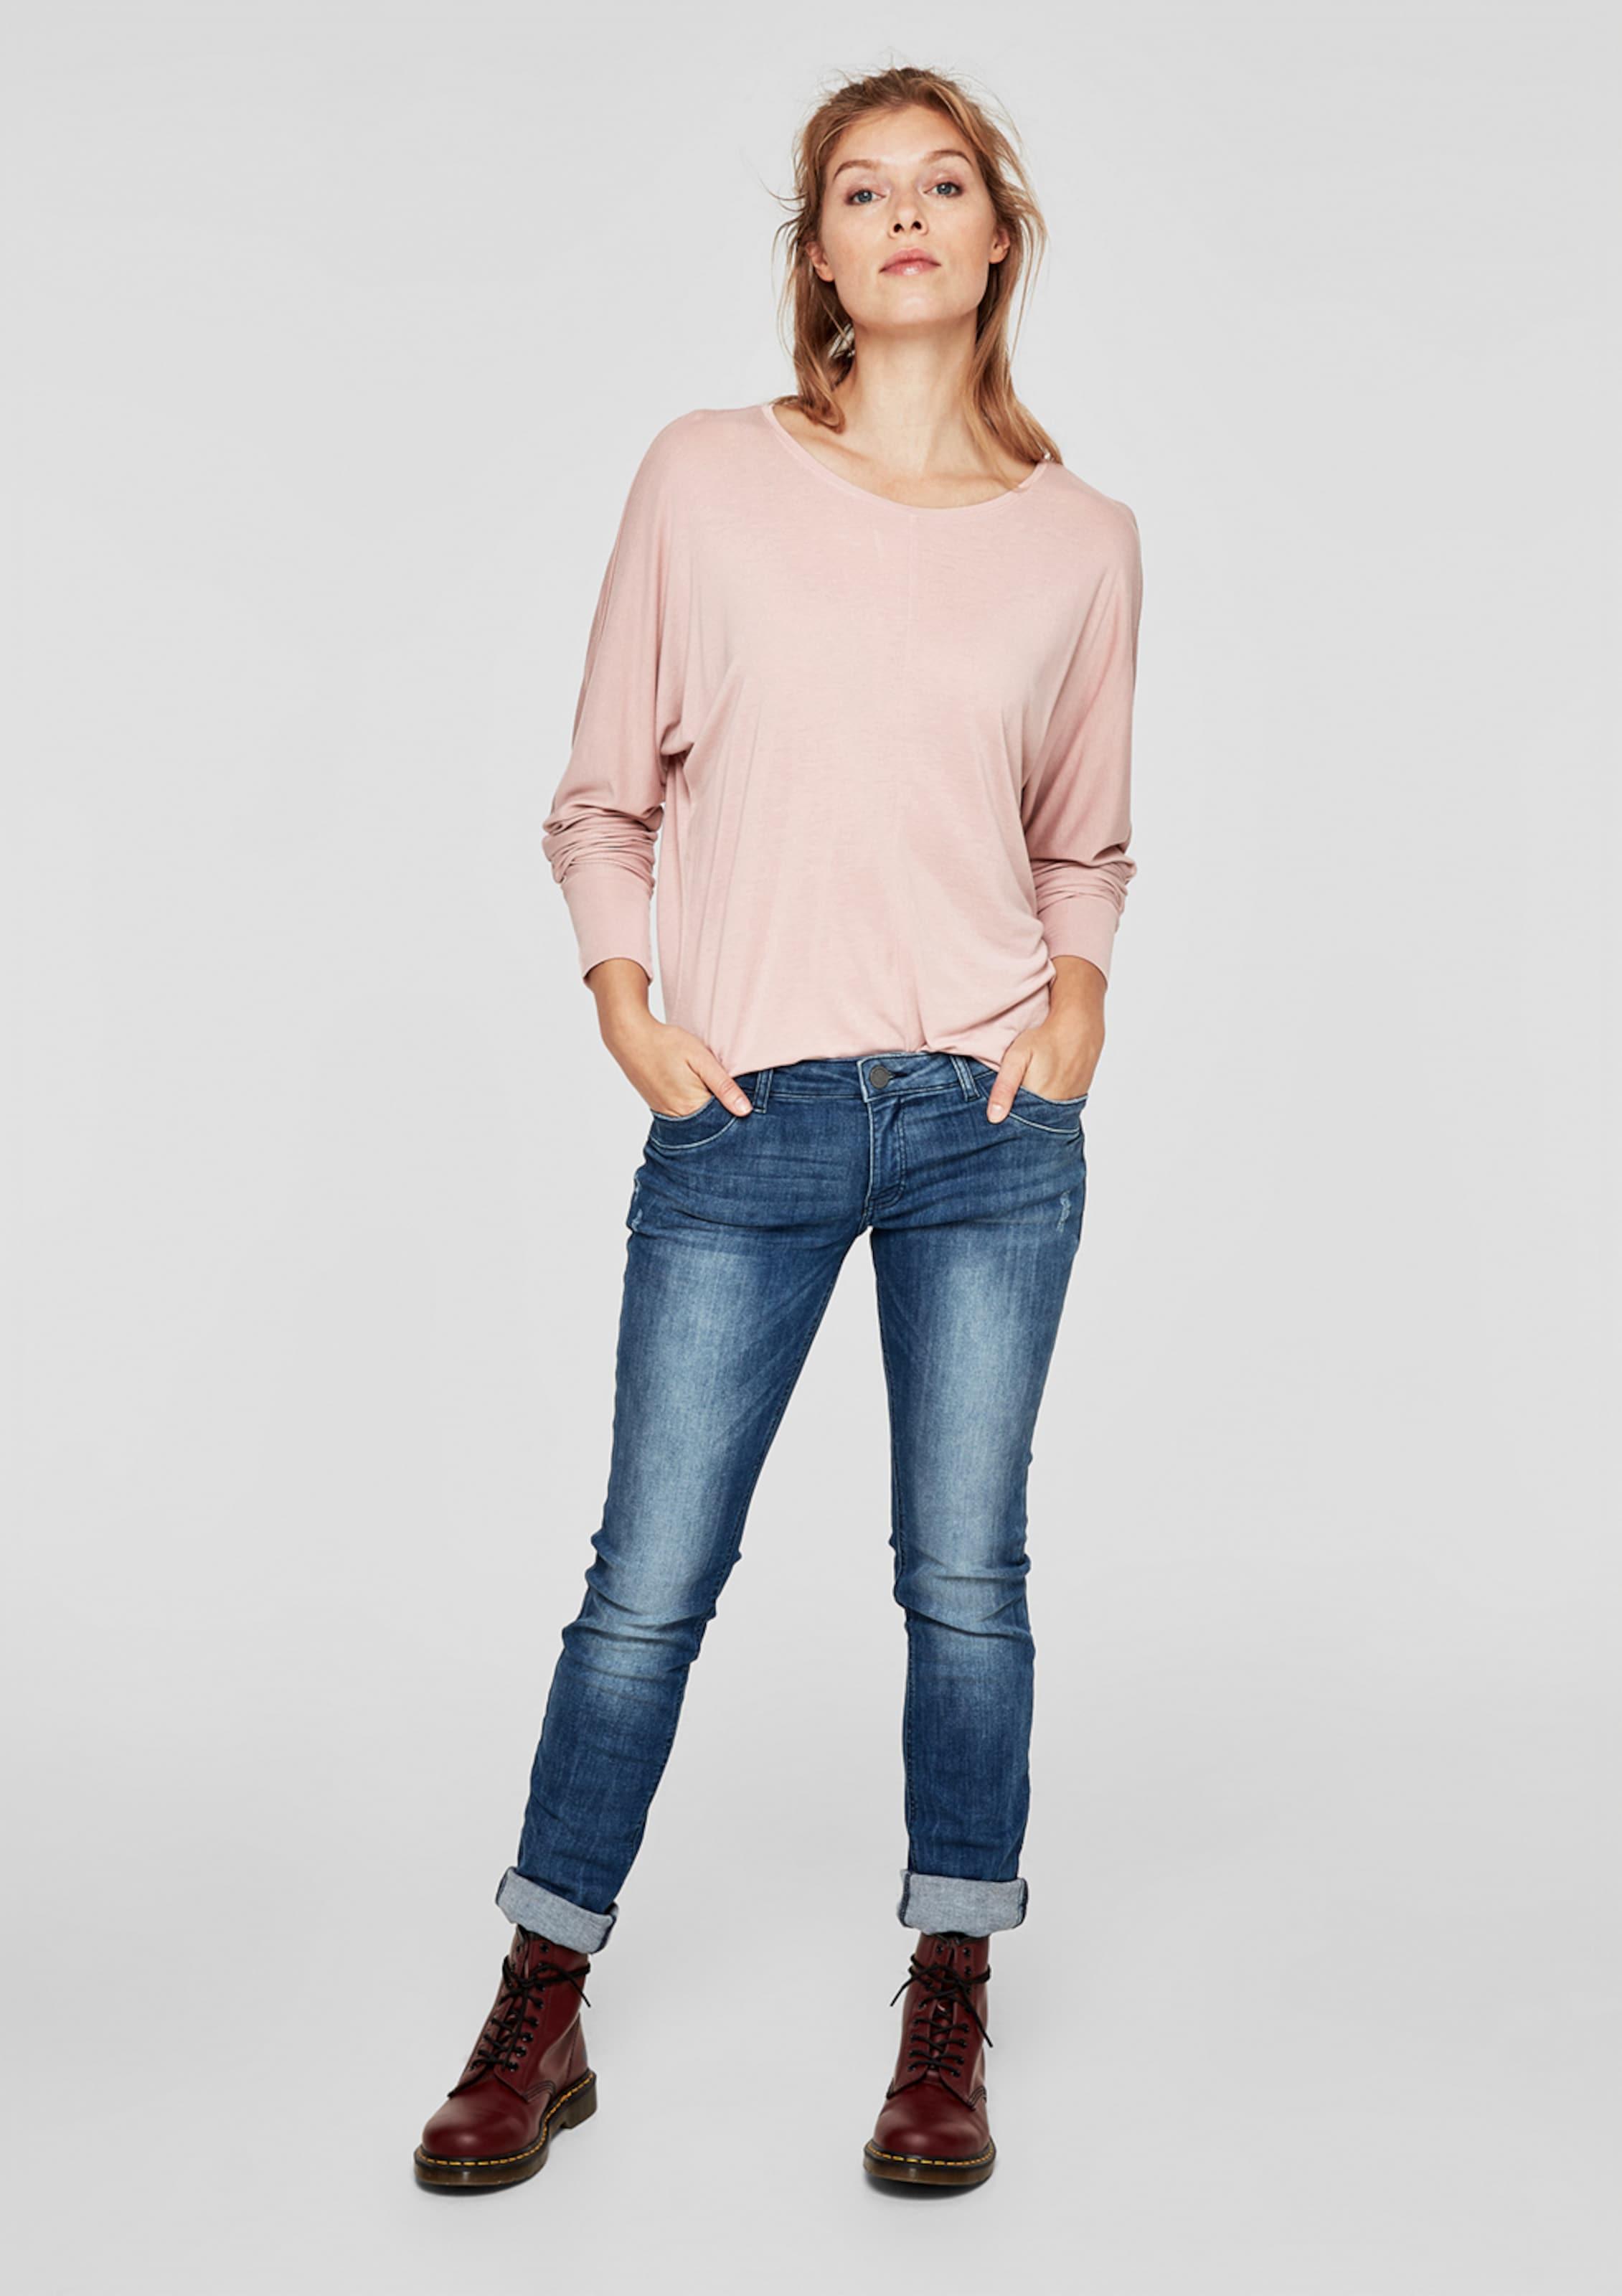 s By Jerseyshirt In Q Designed Rosa SVMUzp